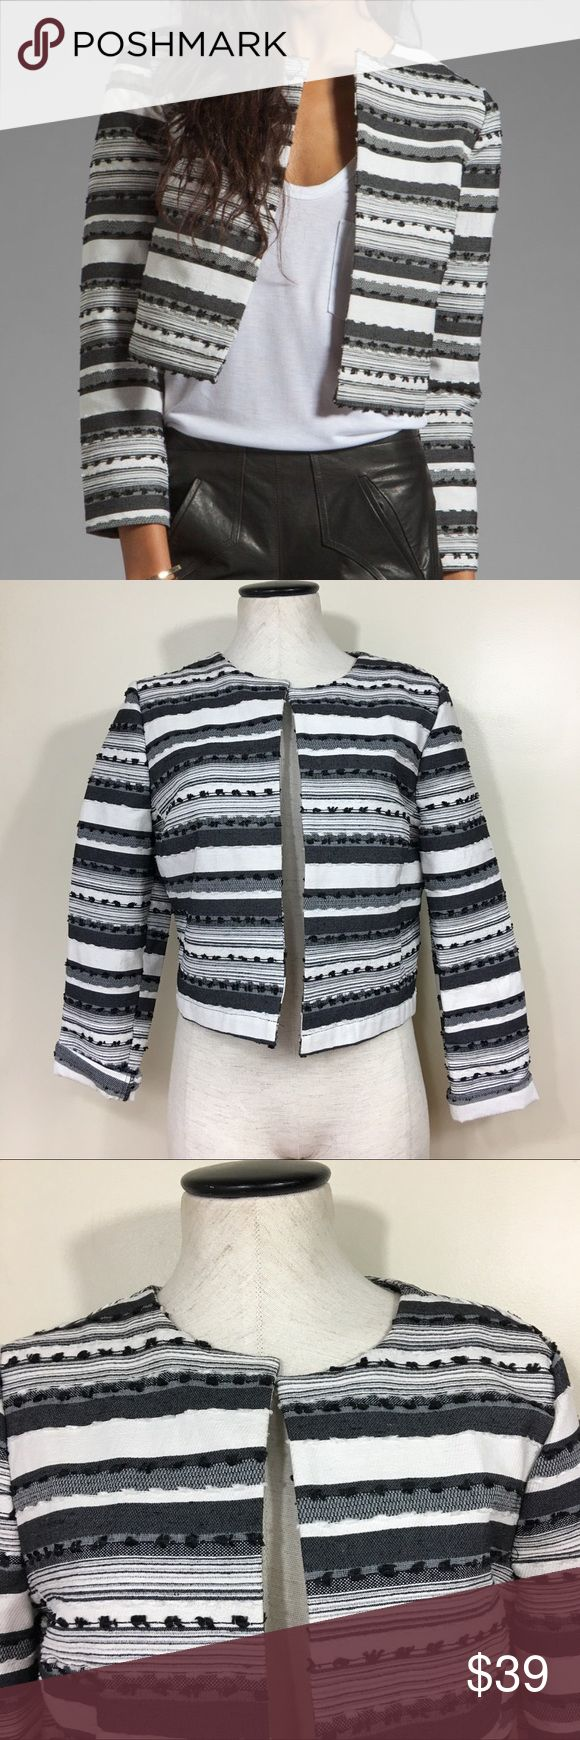 BB Dakota Jariah Striped Textured Crop Jacket Size 10 excellent condition. BB Dakota Jariah striped Textured crop jacket. Bust: 19inches. Should to hem: 19inches sleeve length 23inches unrolled. BB Dakota Jackets & Coats Blazers